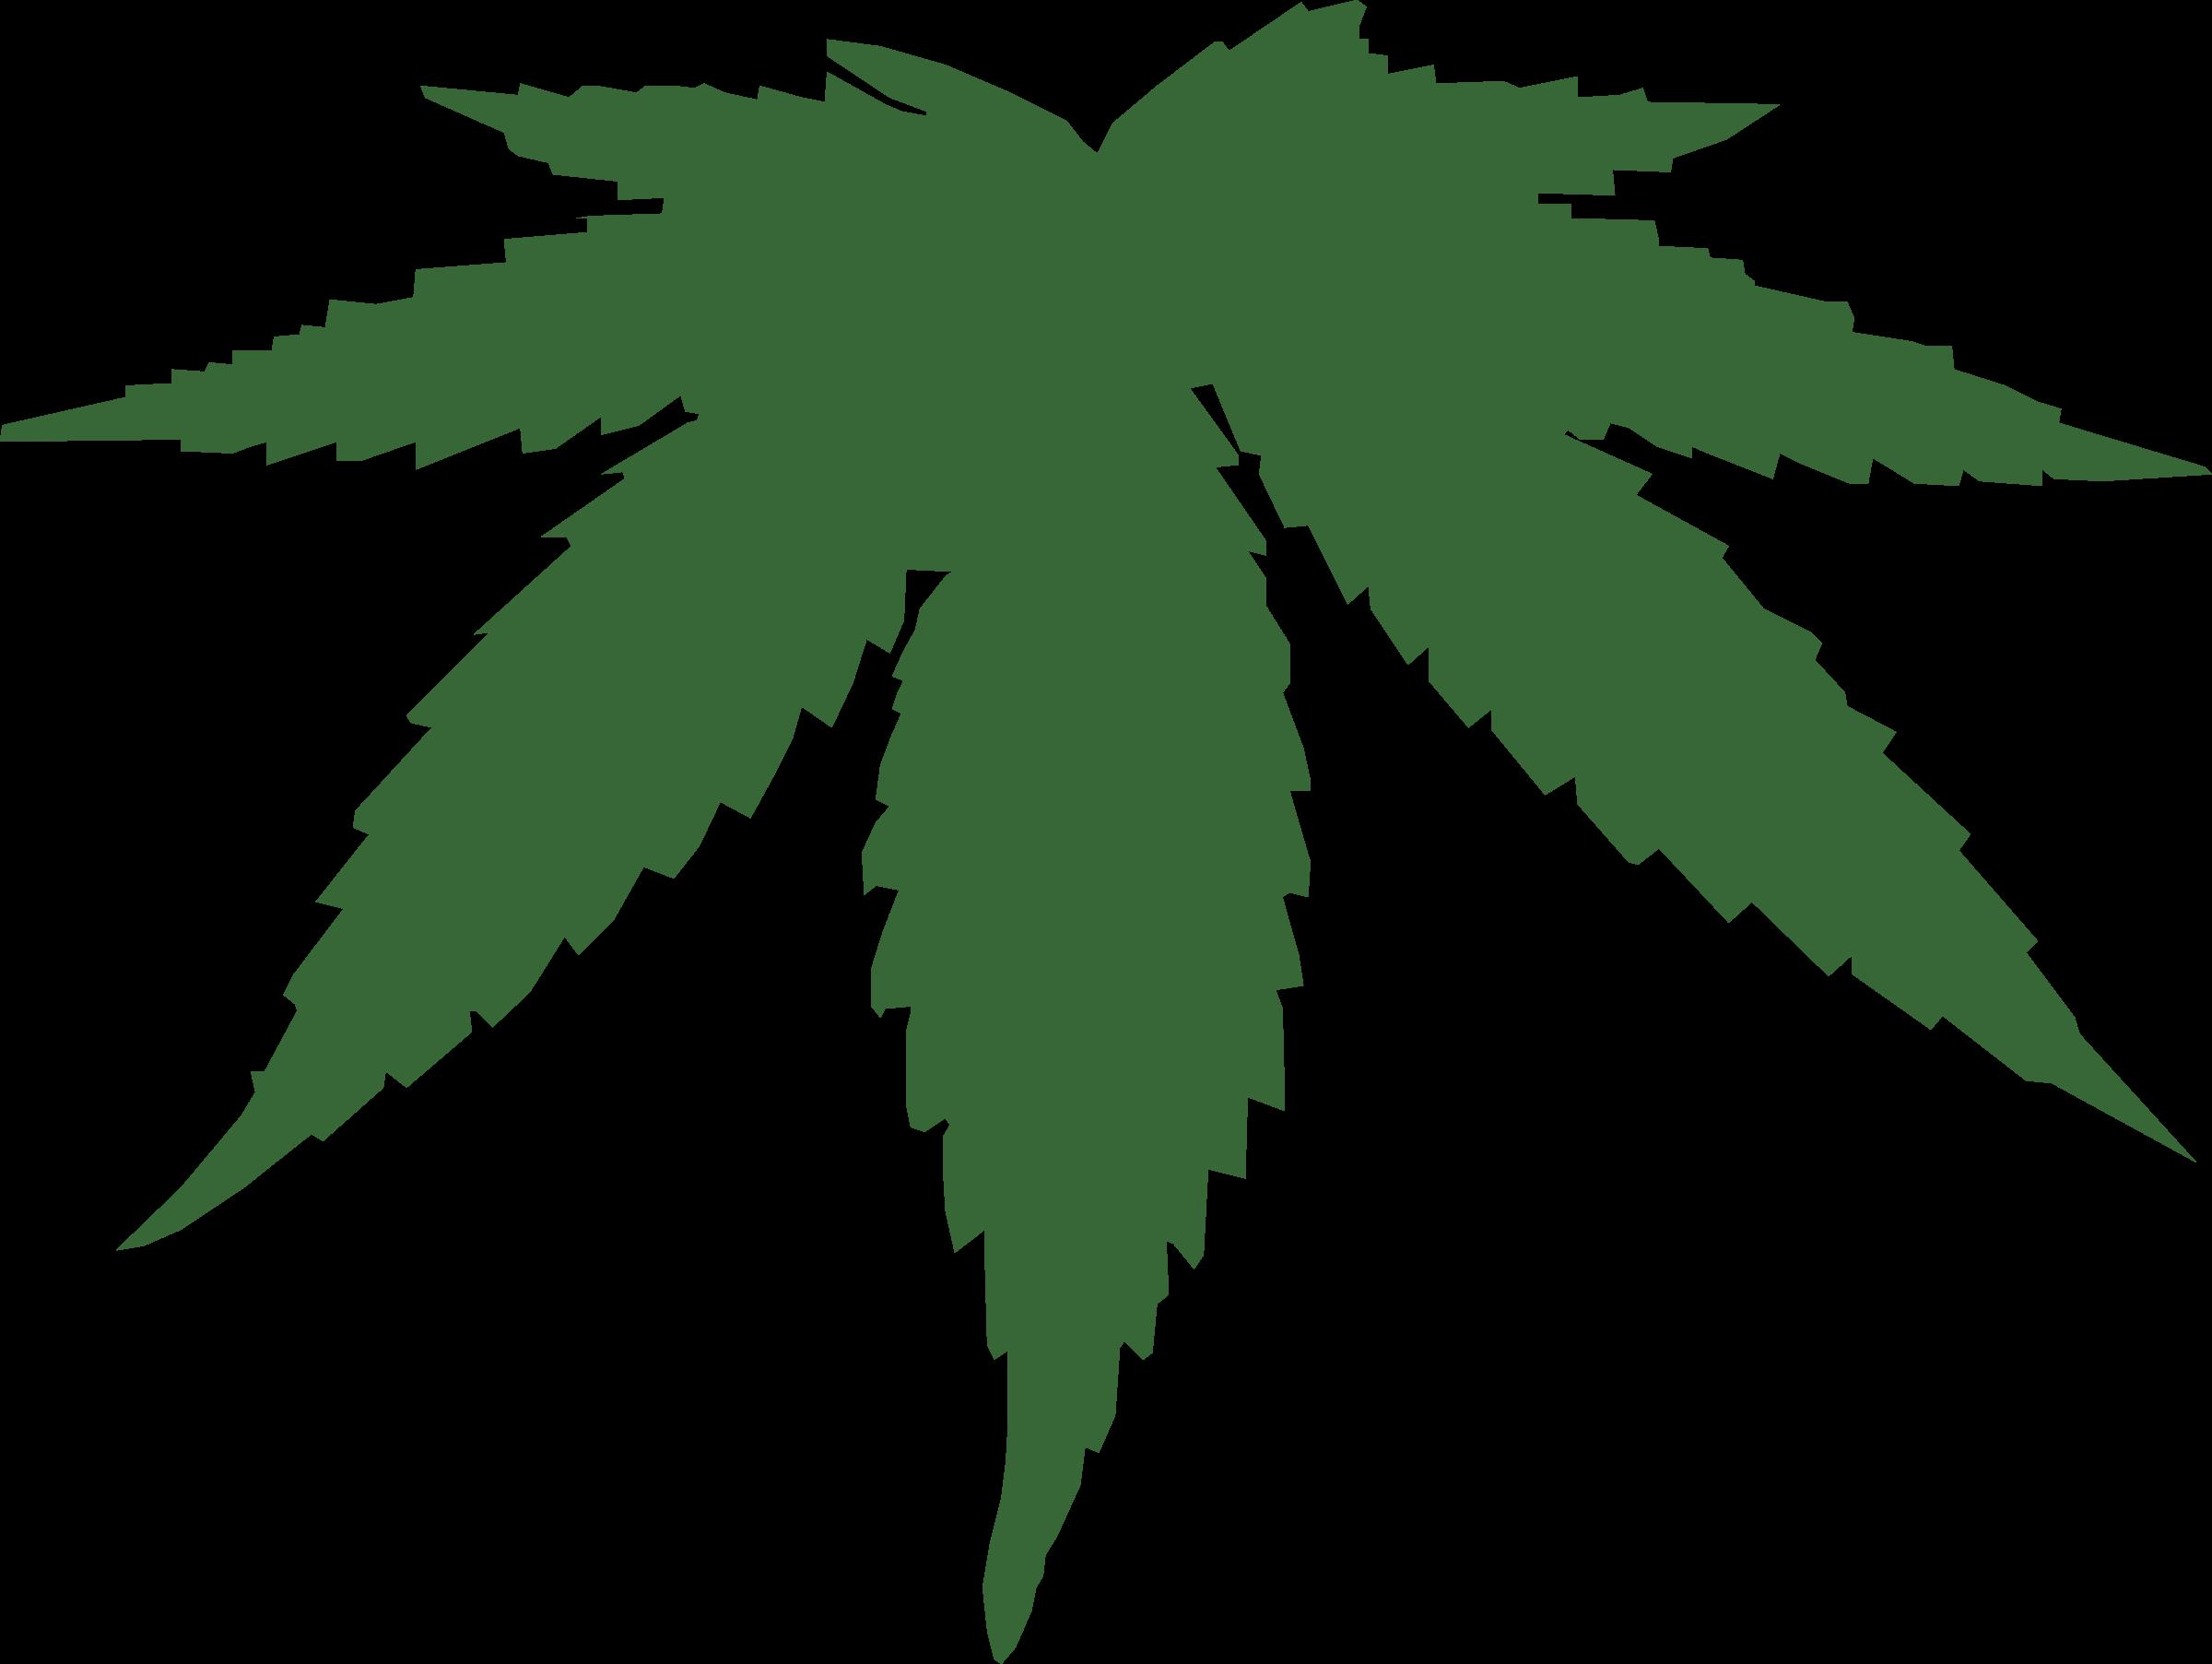 Marijuana clipart pdf. Leaf silhouette images at